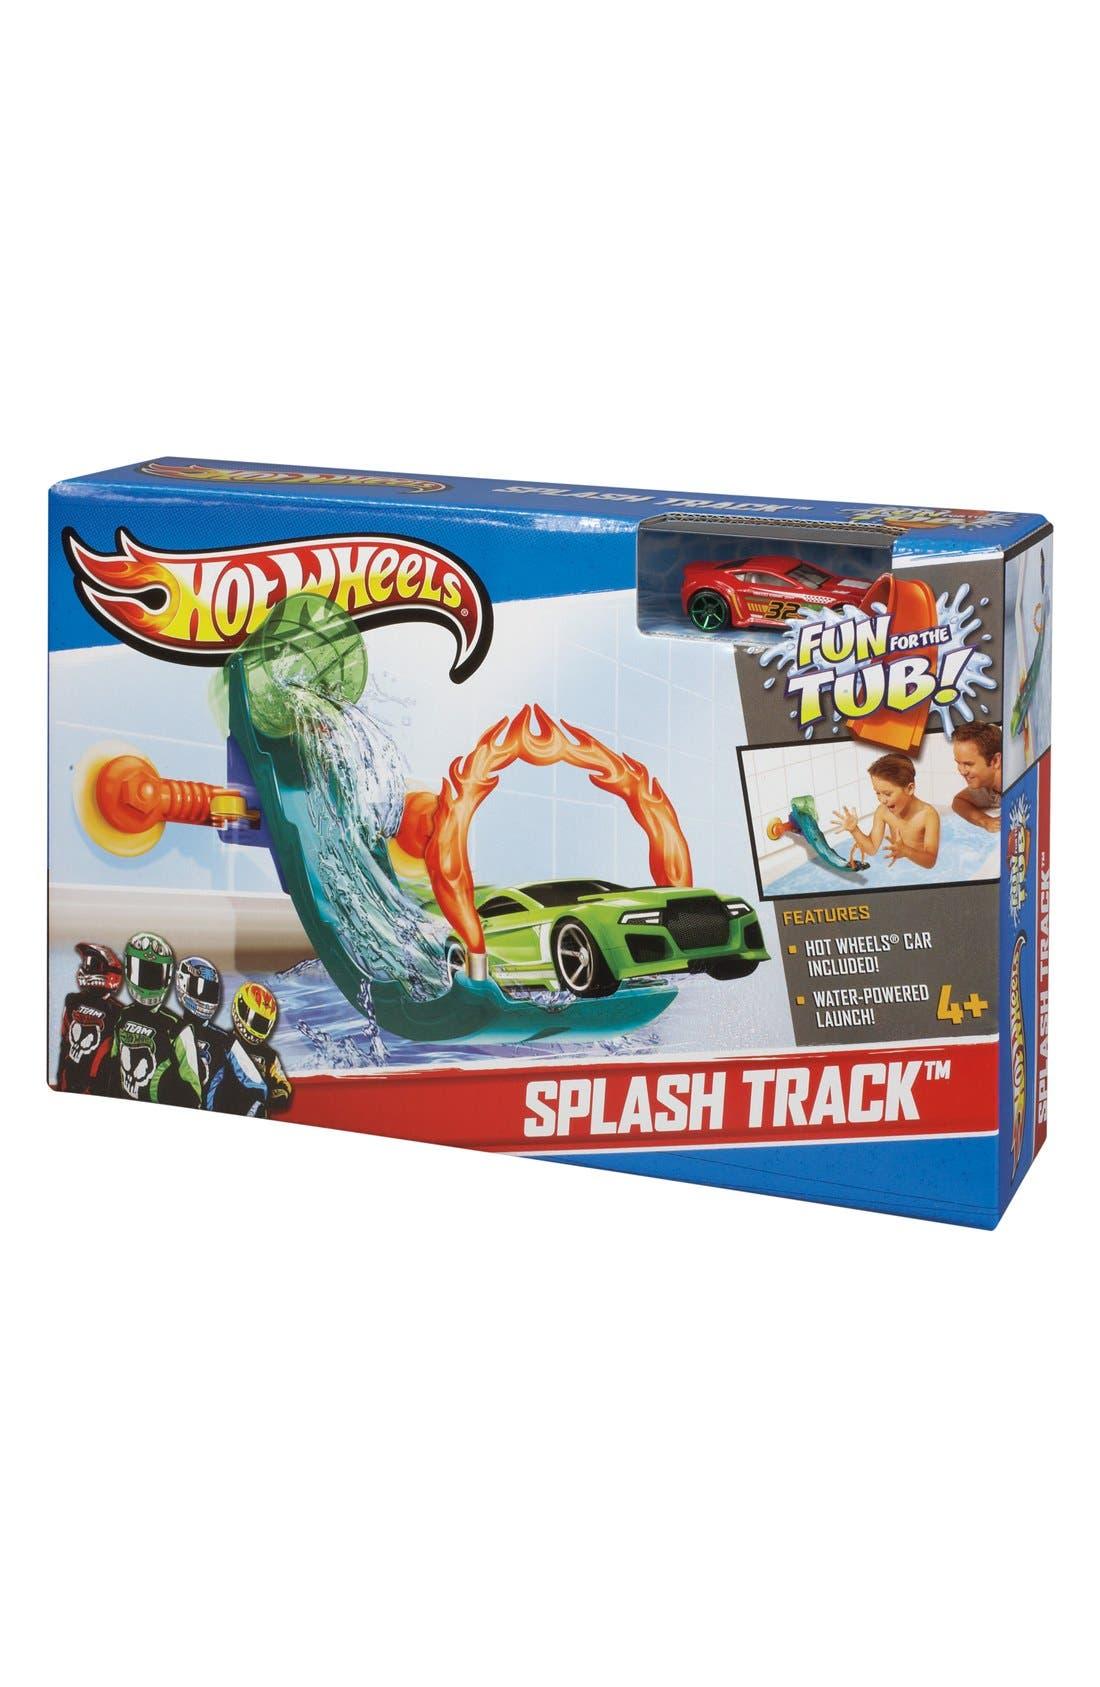 MATTEL 'Hot Wheels<sup>®</sup> - Splash Track<sup>™</sup>' Tub Track Set, Main, color, 400